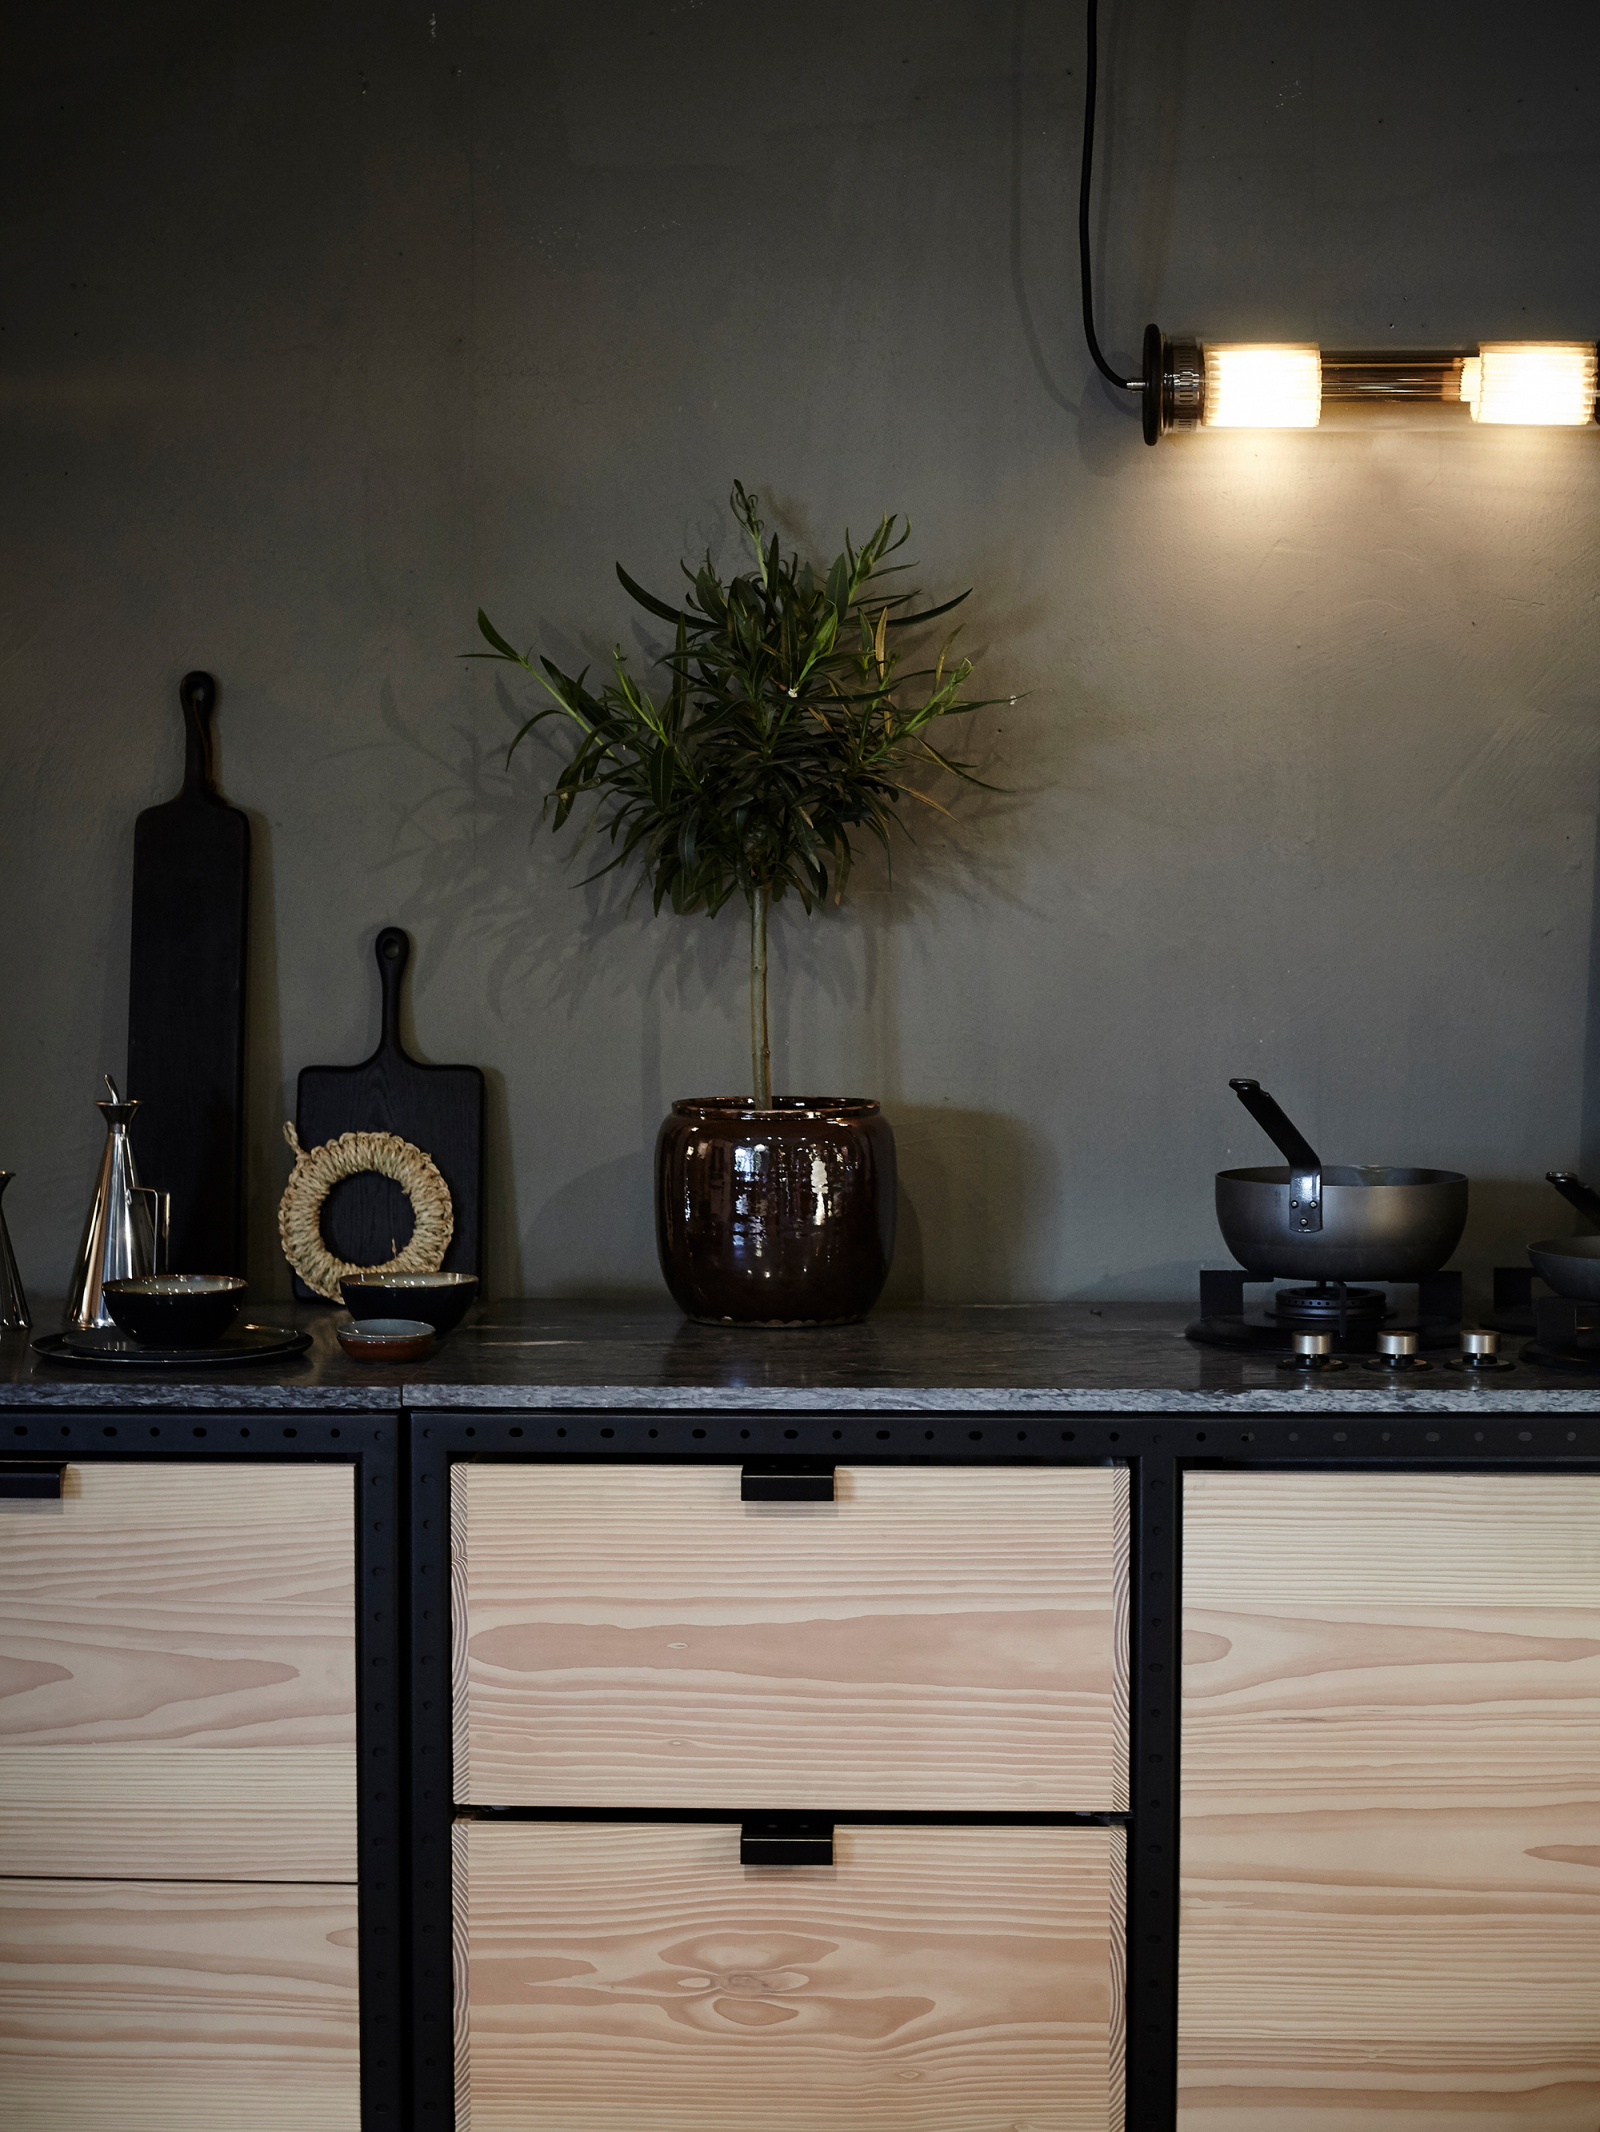 Frama Studio Kitchen hos Artilleriet, Magasinsgatan 19, Göteborg